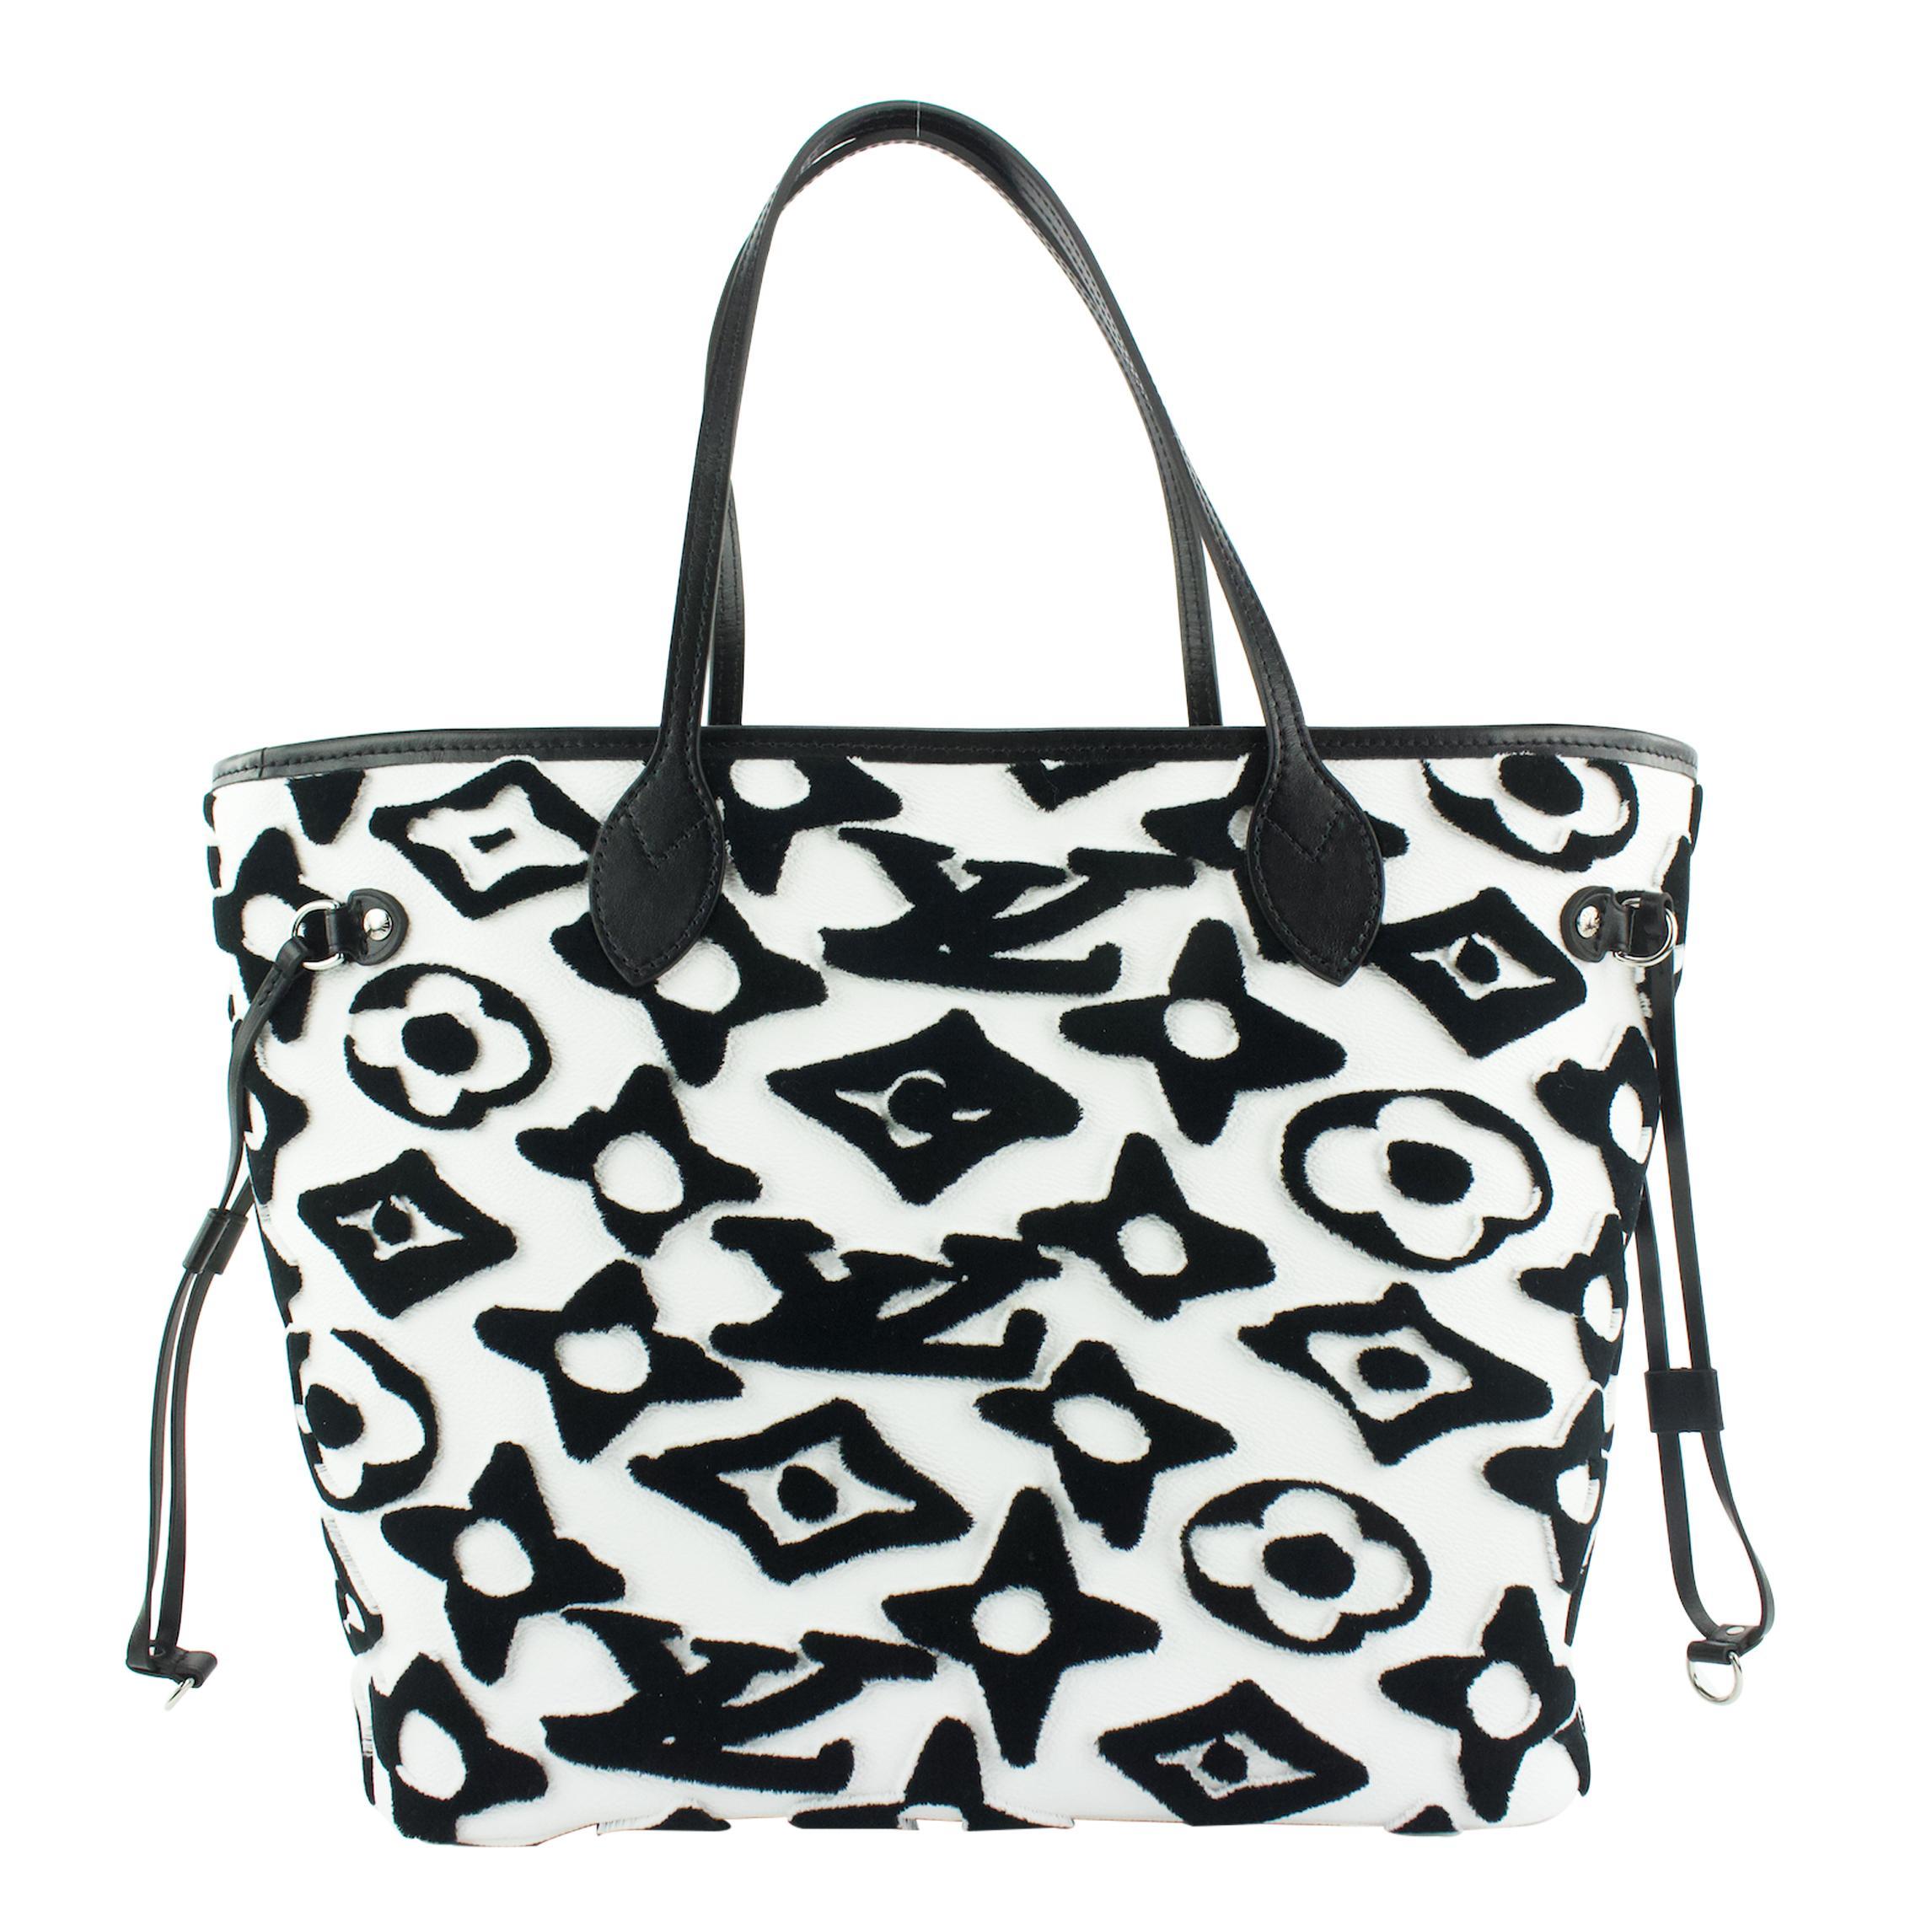 black-and-white-monogram-tuffetage-canvas-lv-x-uf-neverfull-mm-tote-58ec